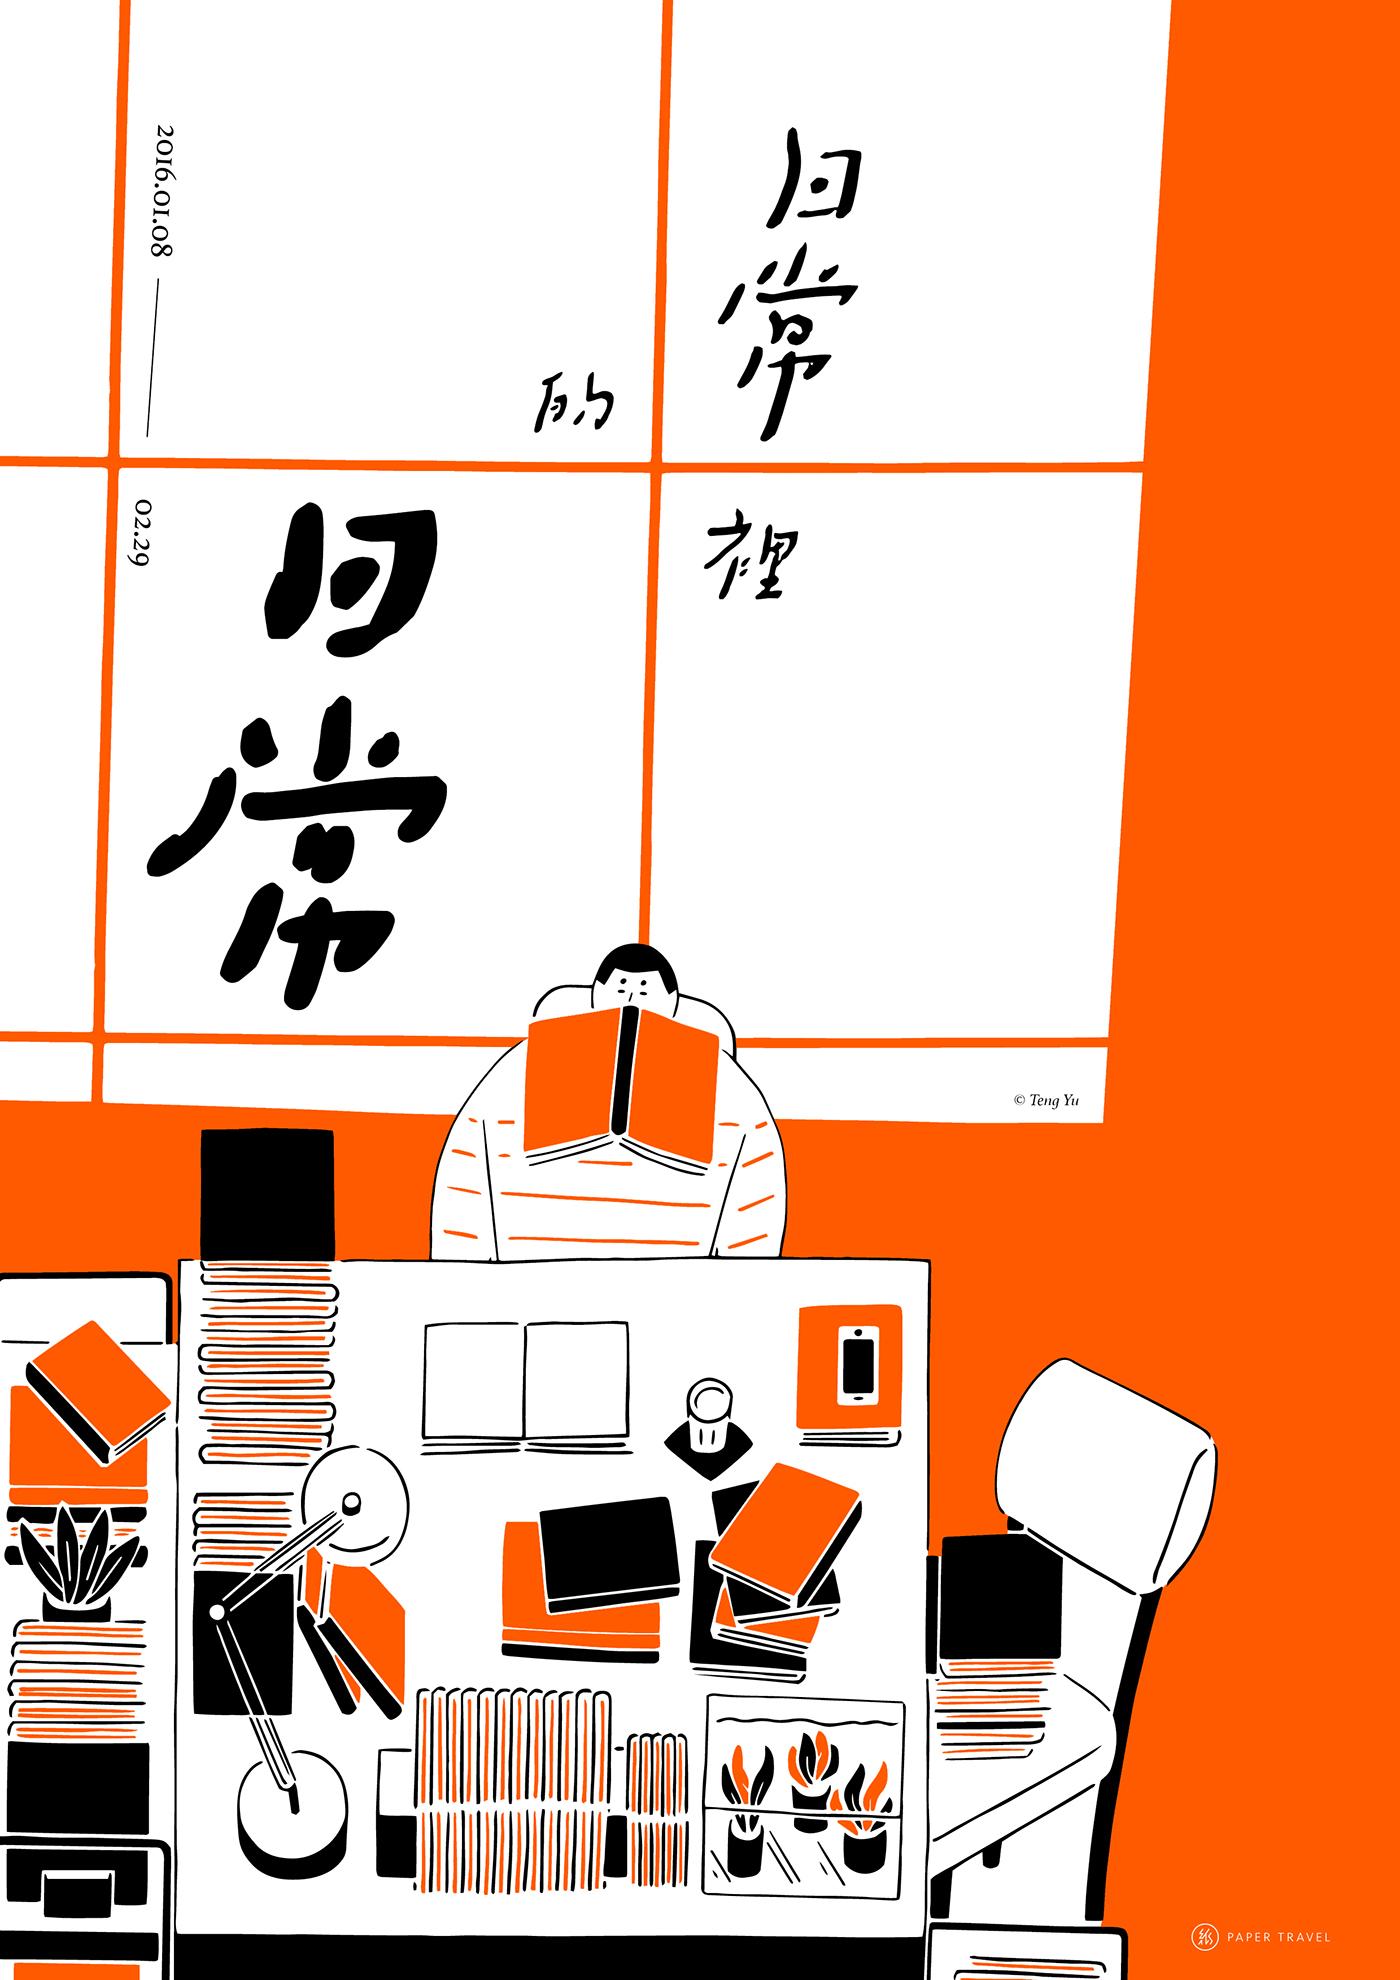 Sunny Day on Behance | Sunny days, Logo color schemes